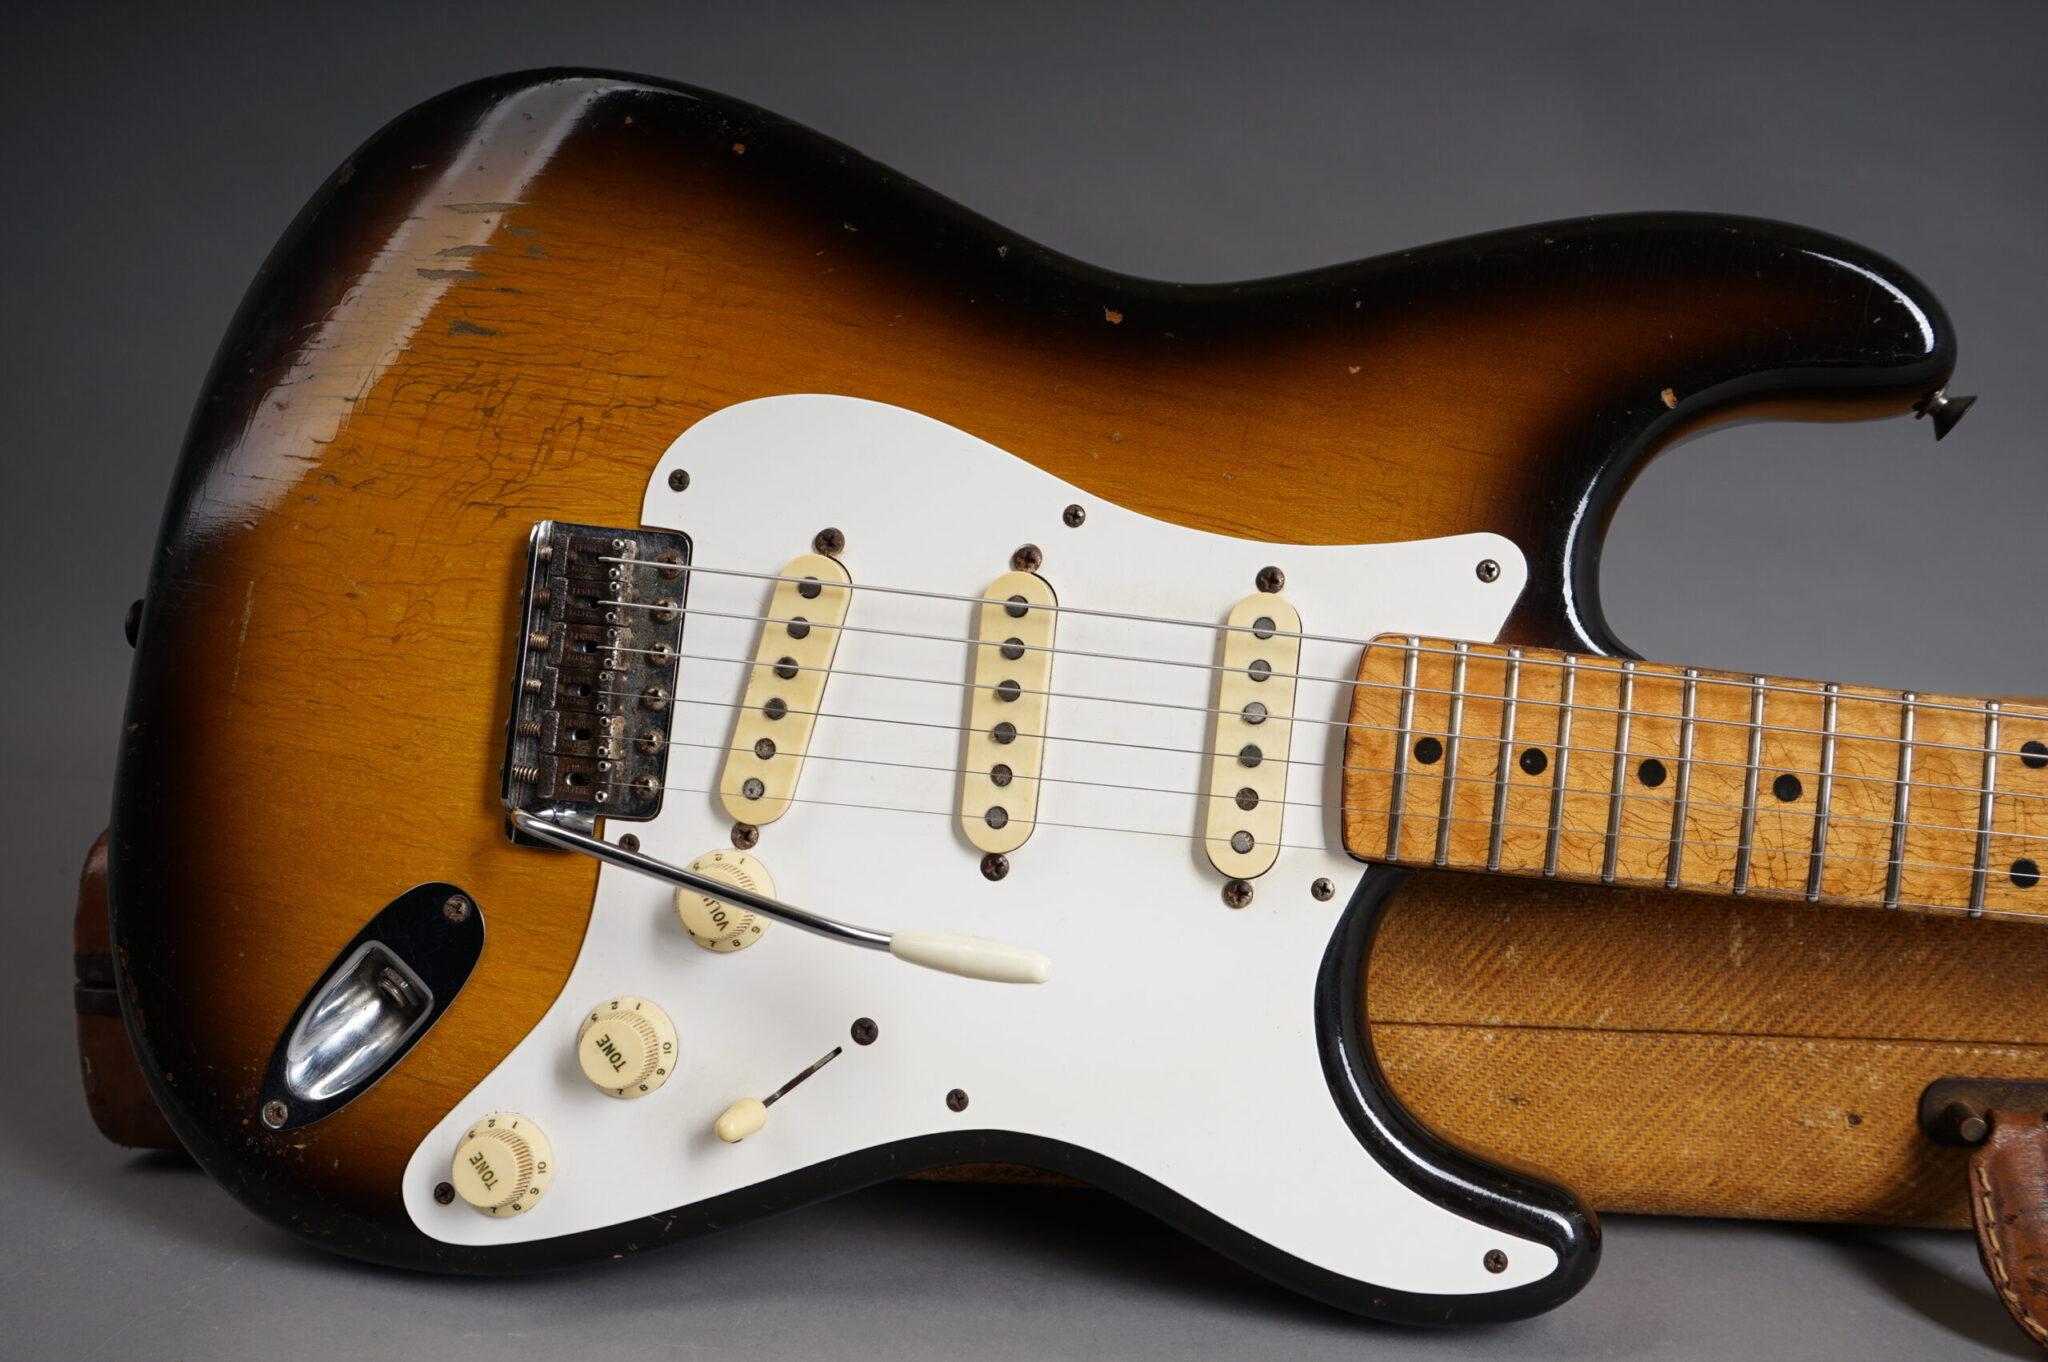 https://guitarpoint.de/app/uploads/products/1957-fender-stratocaster-sunburst-2/1957-Fender-Stratocaster-Sunburst-025762-9-scaled-2048x1362.jpg